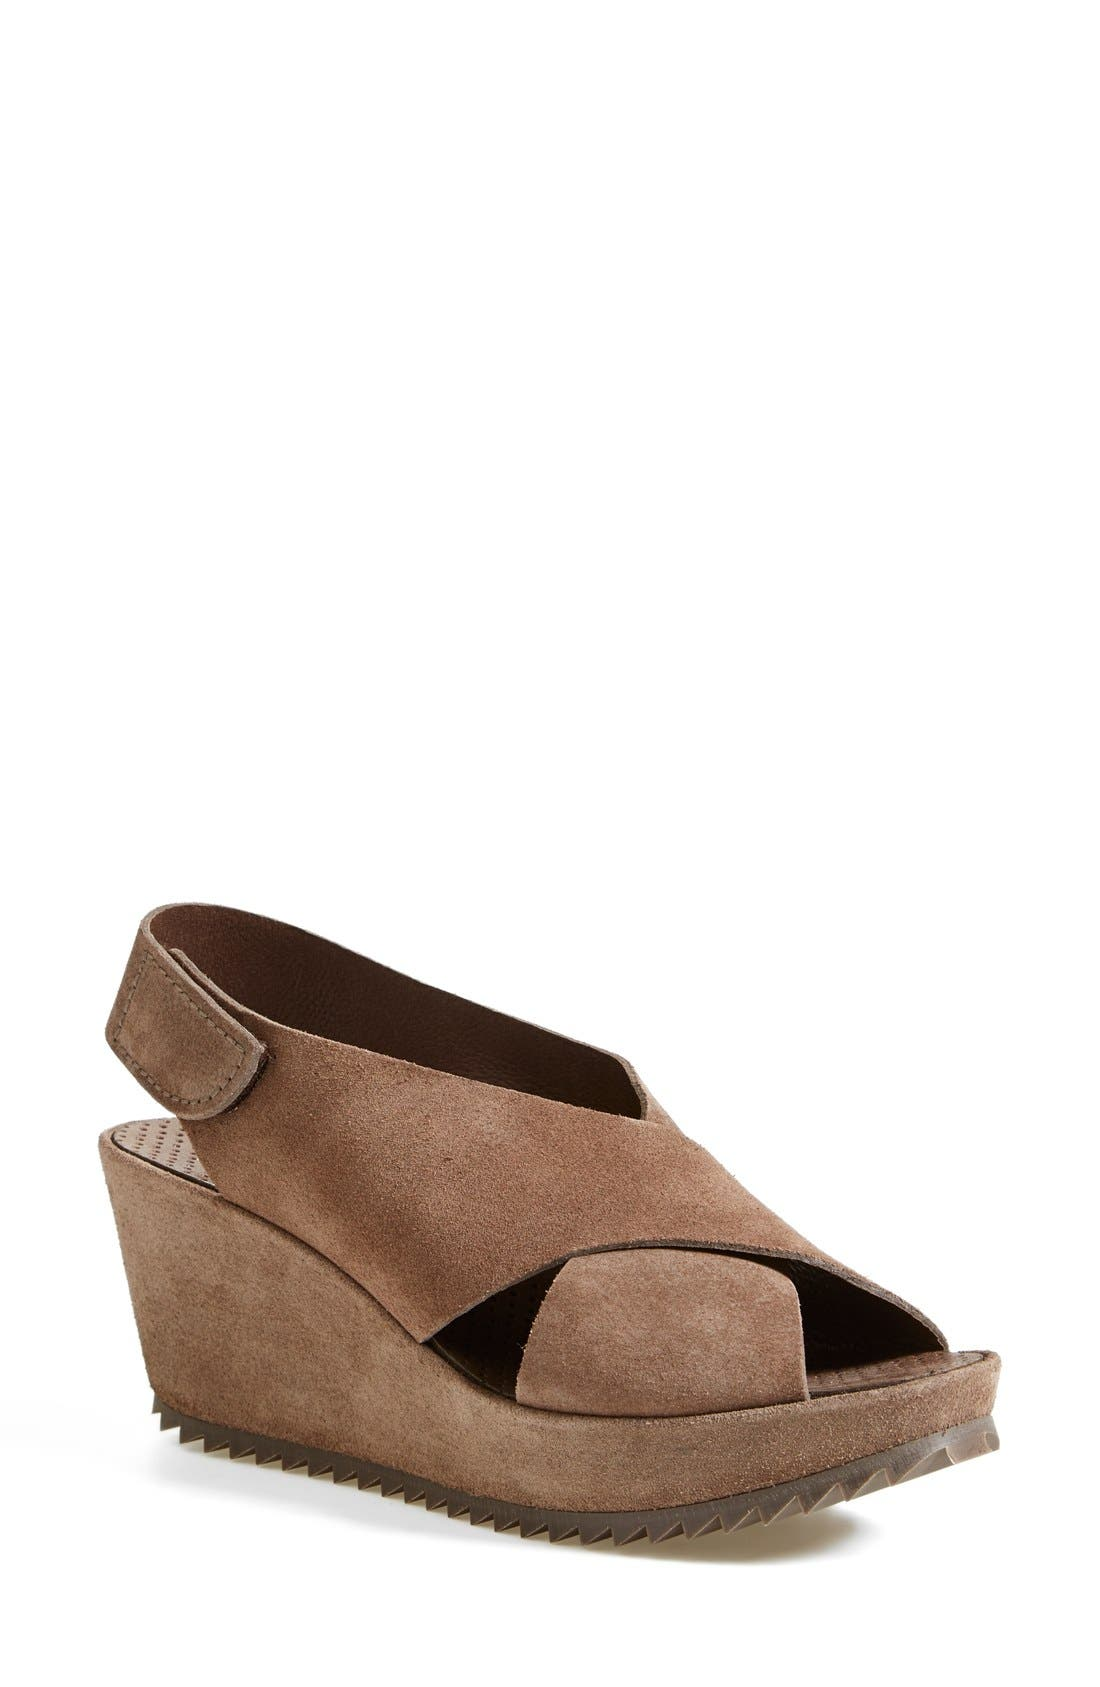 'Federica' Wedge Sandal,                             Main thumbnail 4, color,